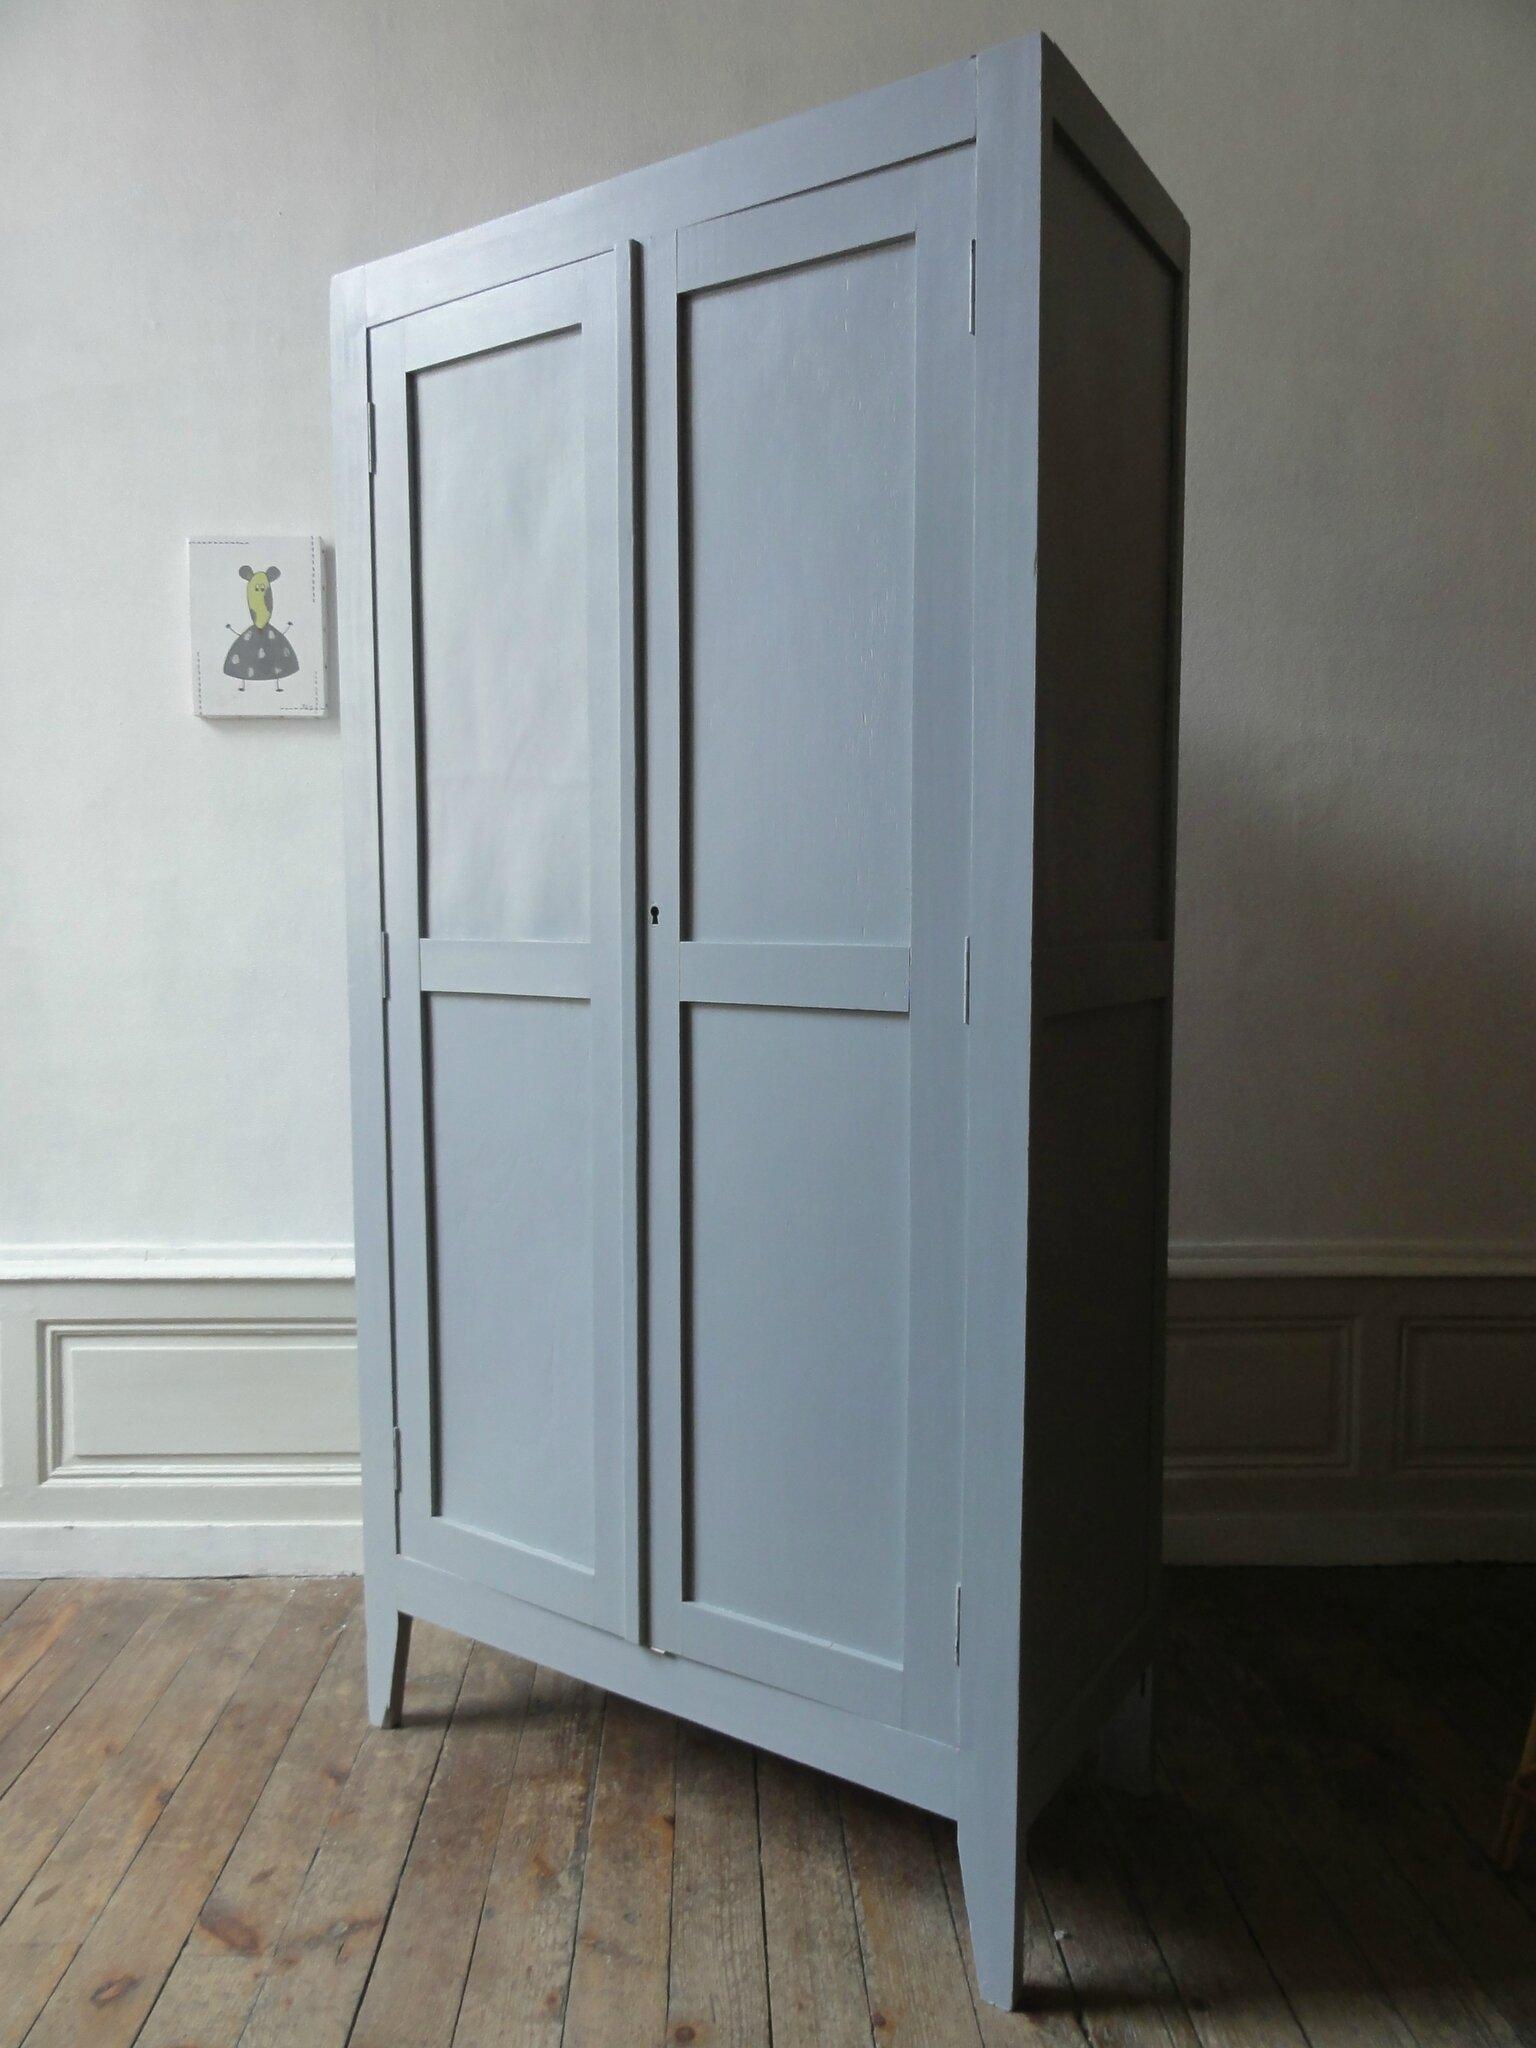 armoire parisienne annees 40 vintage moi. Black Bedroom Furniture Sets. Home Design Ideas